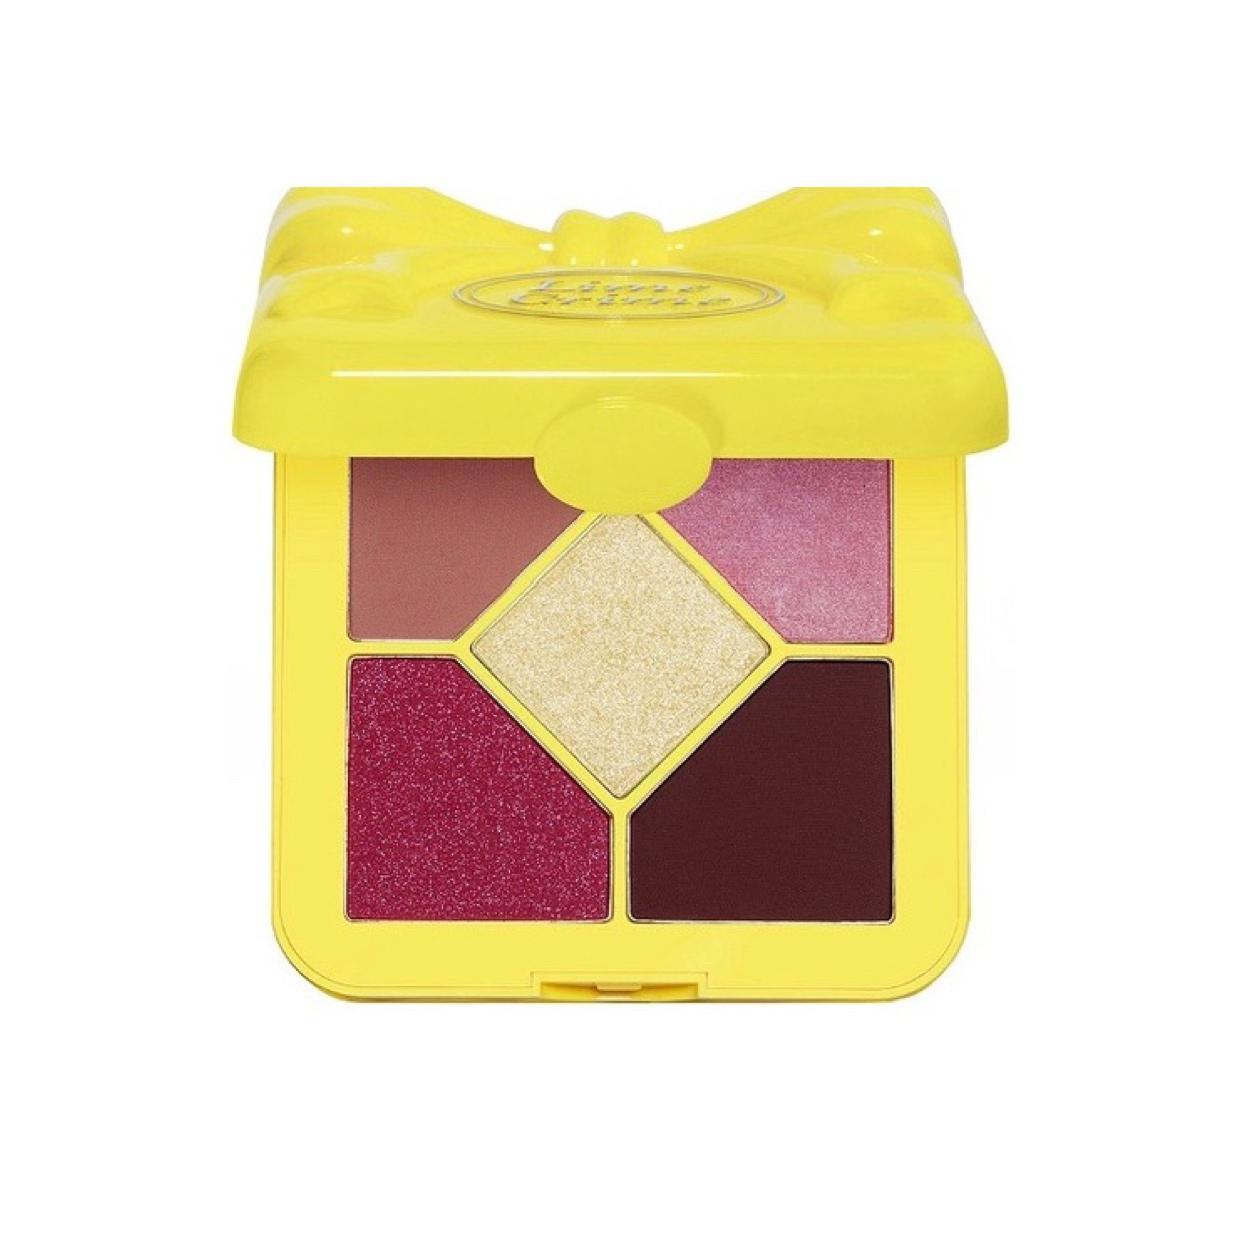 Палетка теней Lime Crime Pocket Candy Pink Lemonade